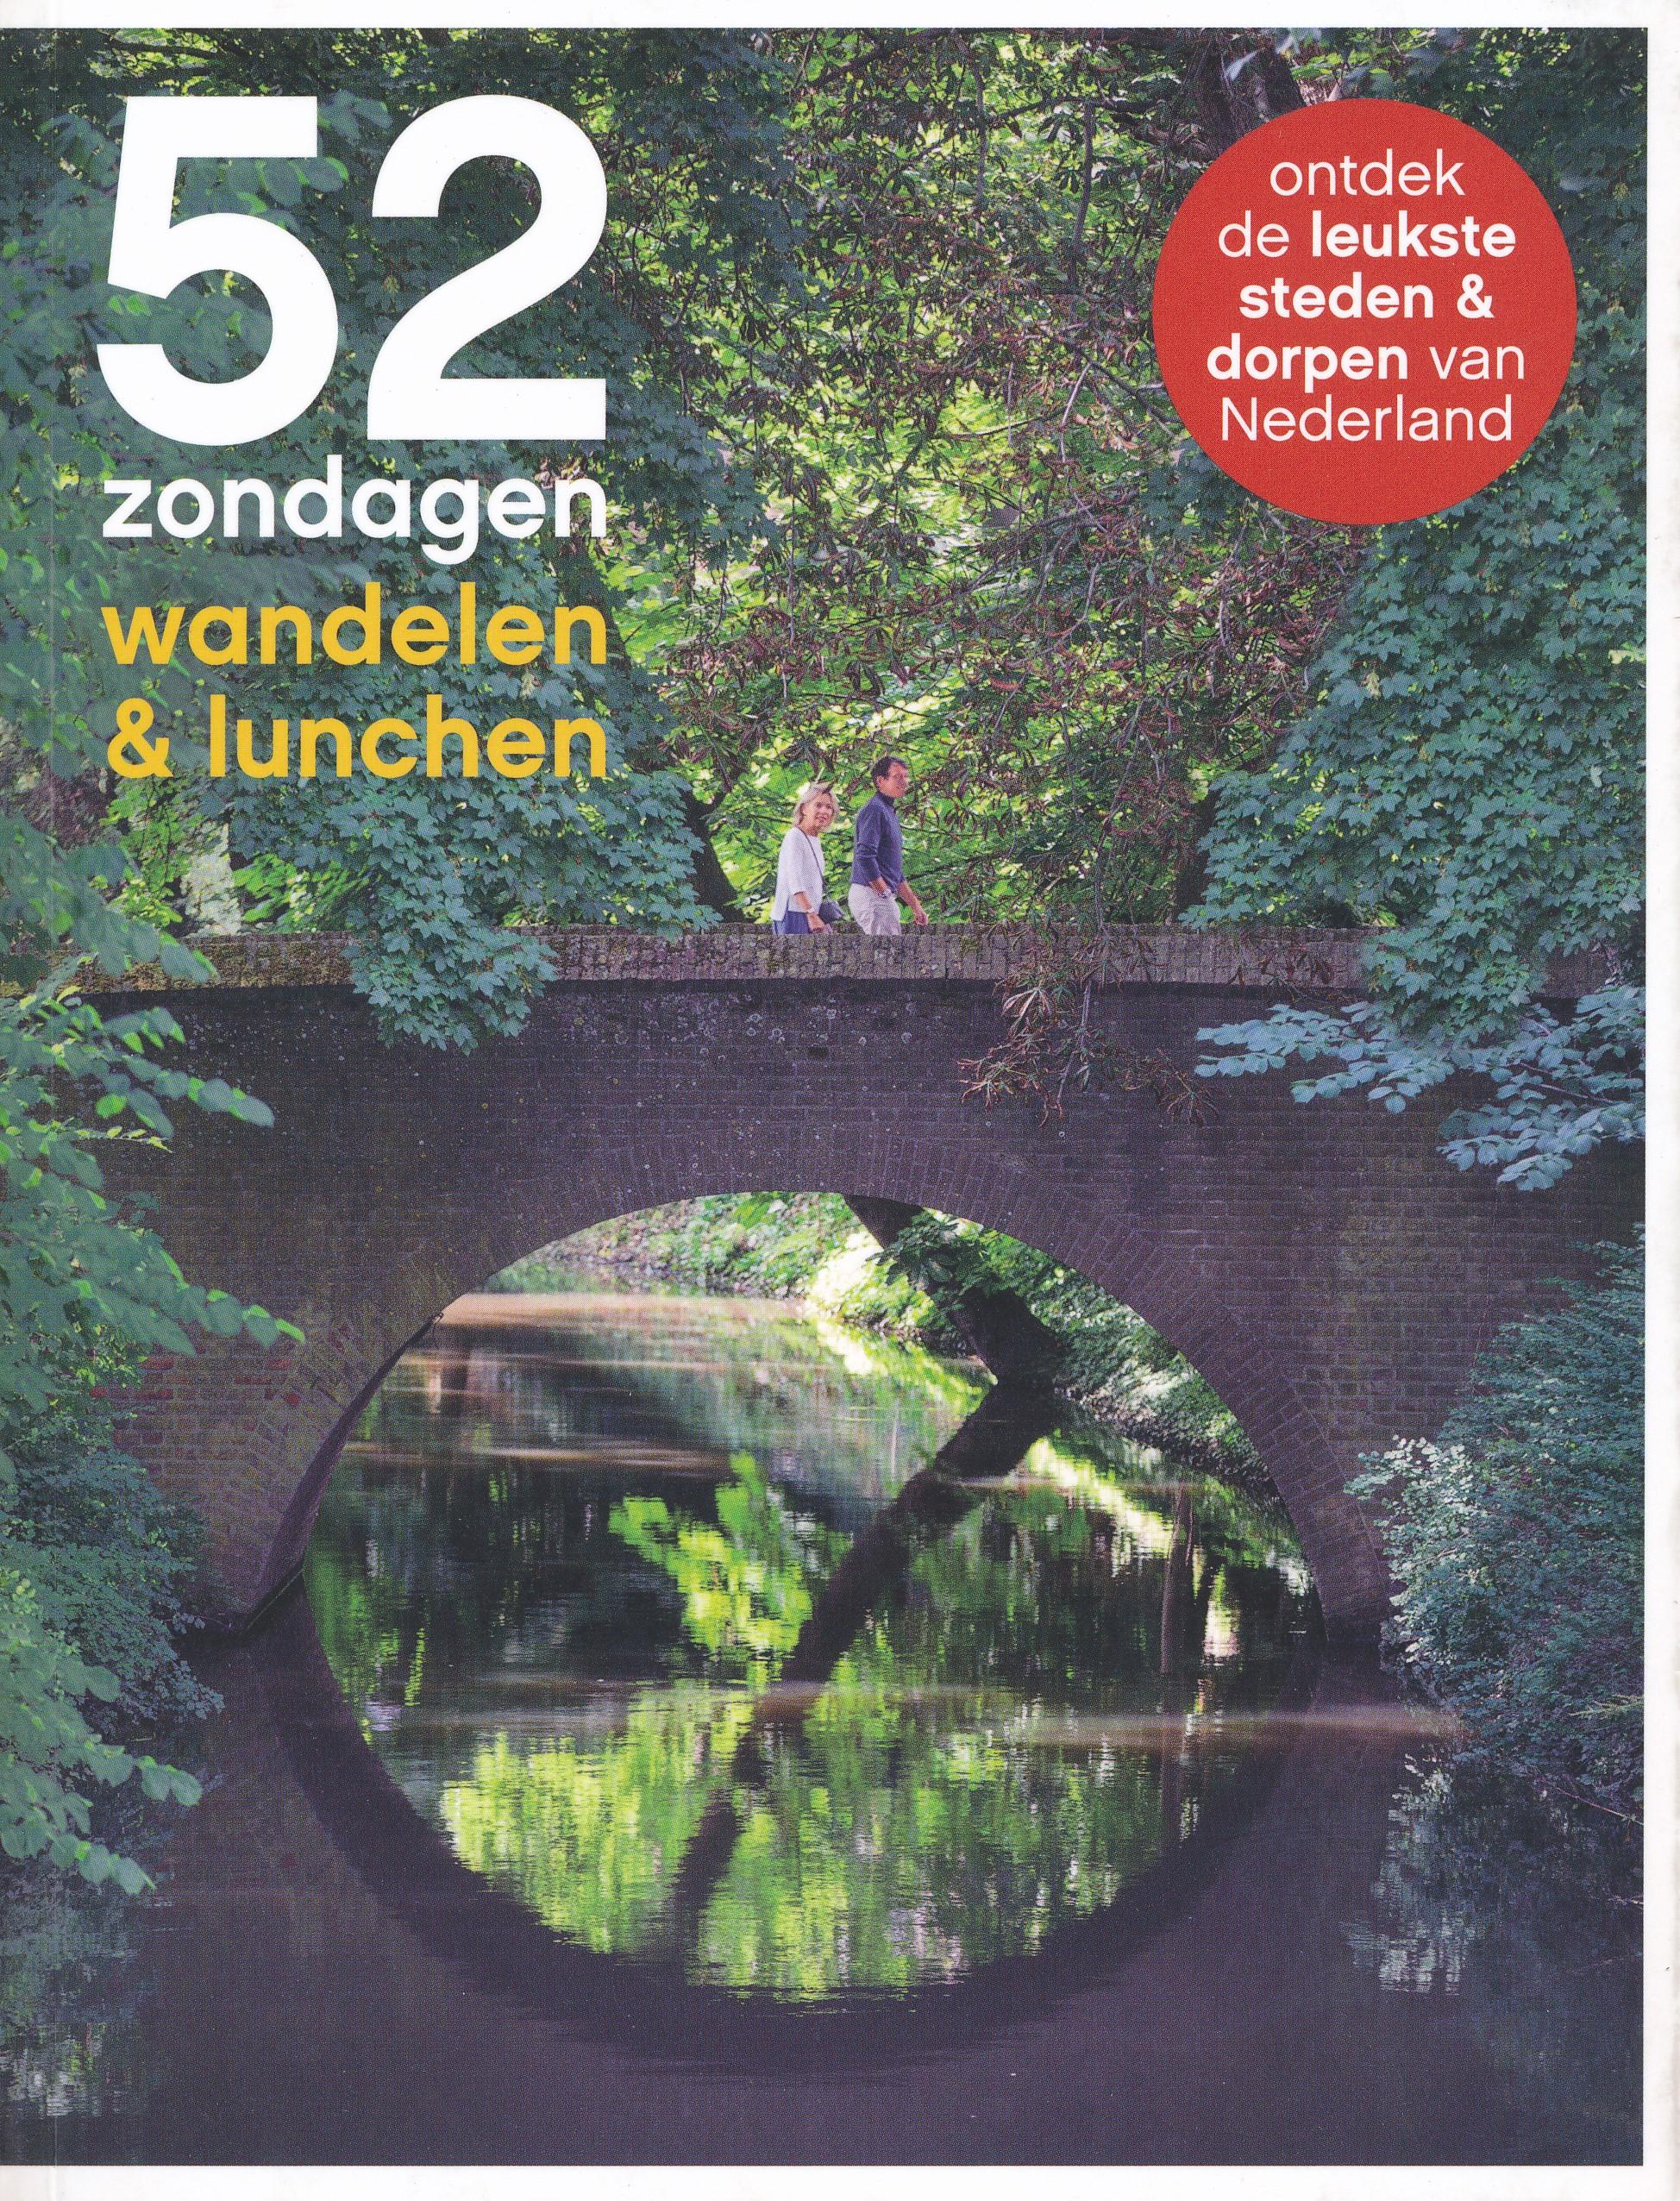 Reisgids 52 Zondagen wandelen & lunchen | Mo'Media de zwerver